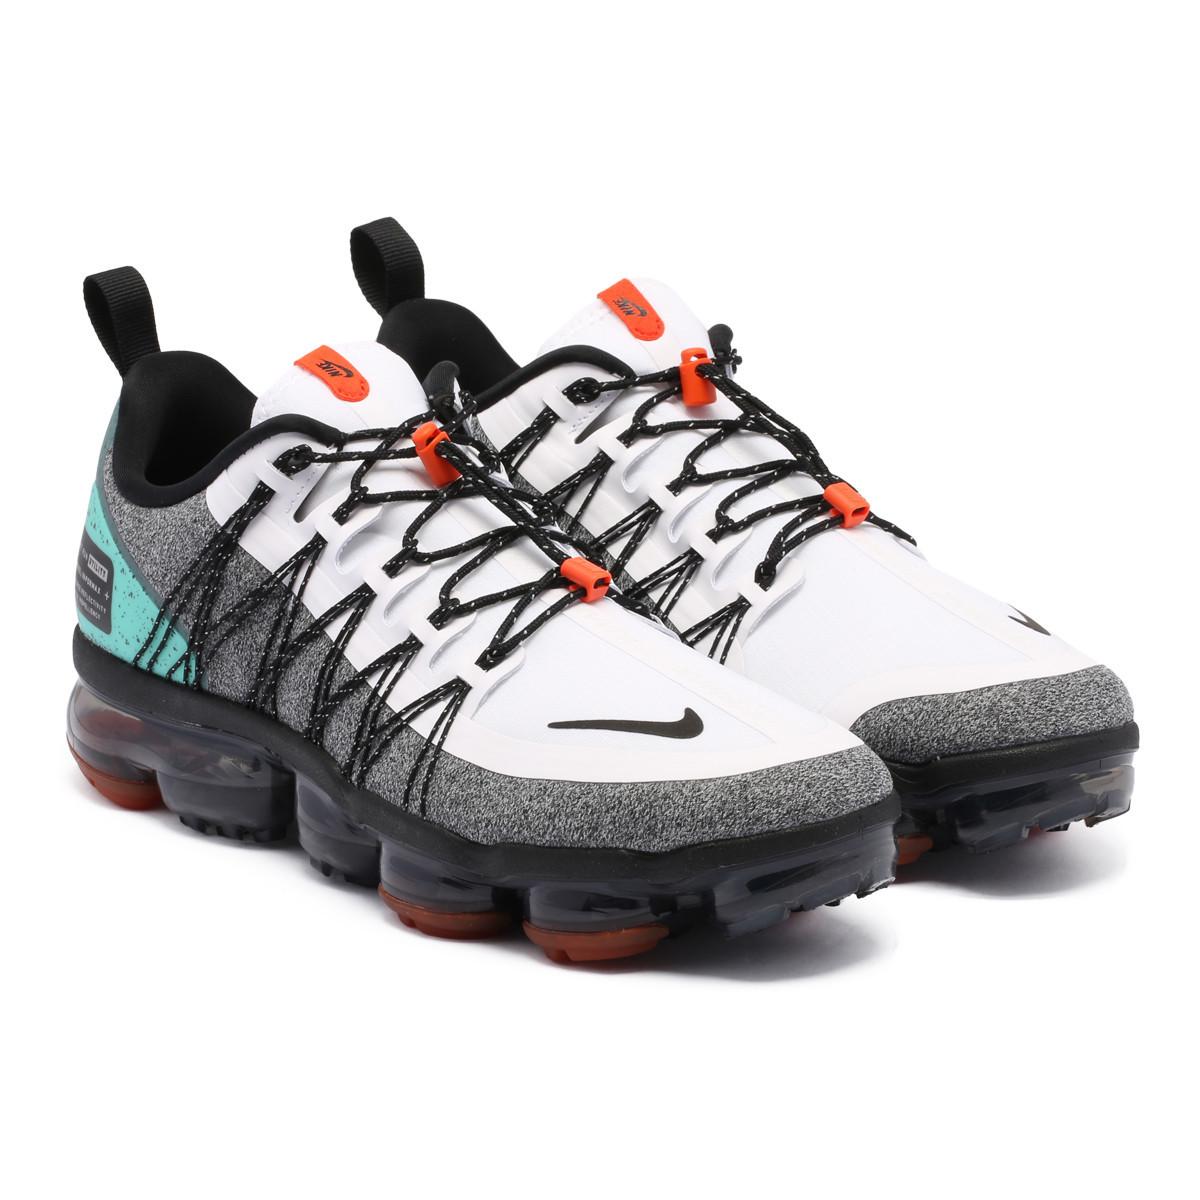 6ac0c8fb59a19 Nike Air VaporMax Utility (Tropical Twist  White  Black) Men 7-13